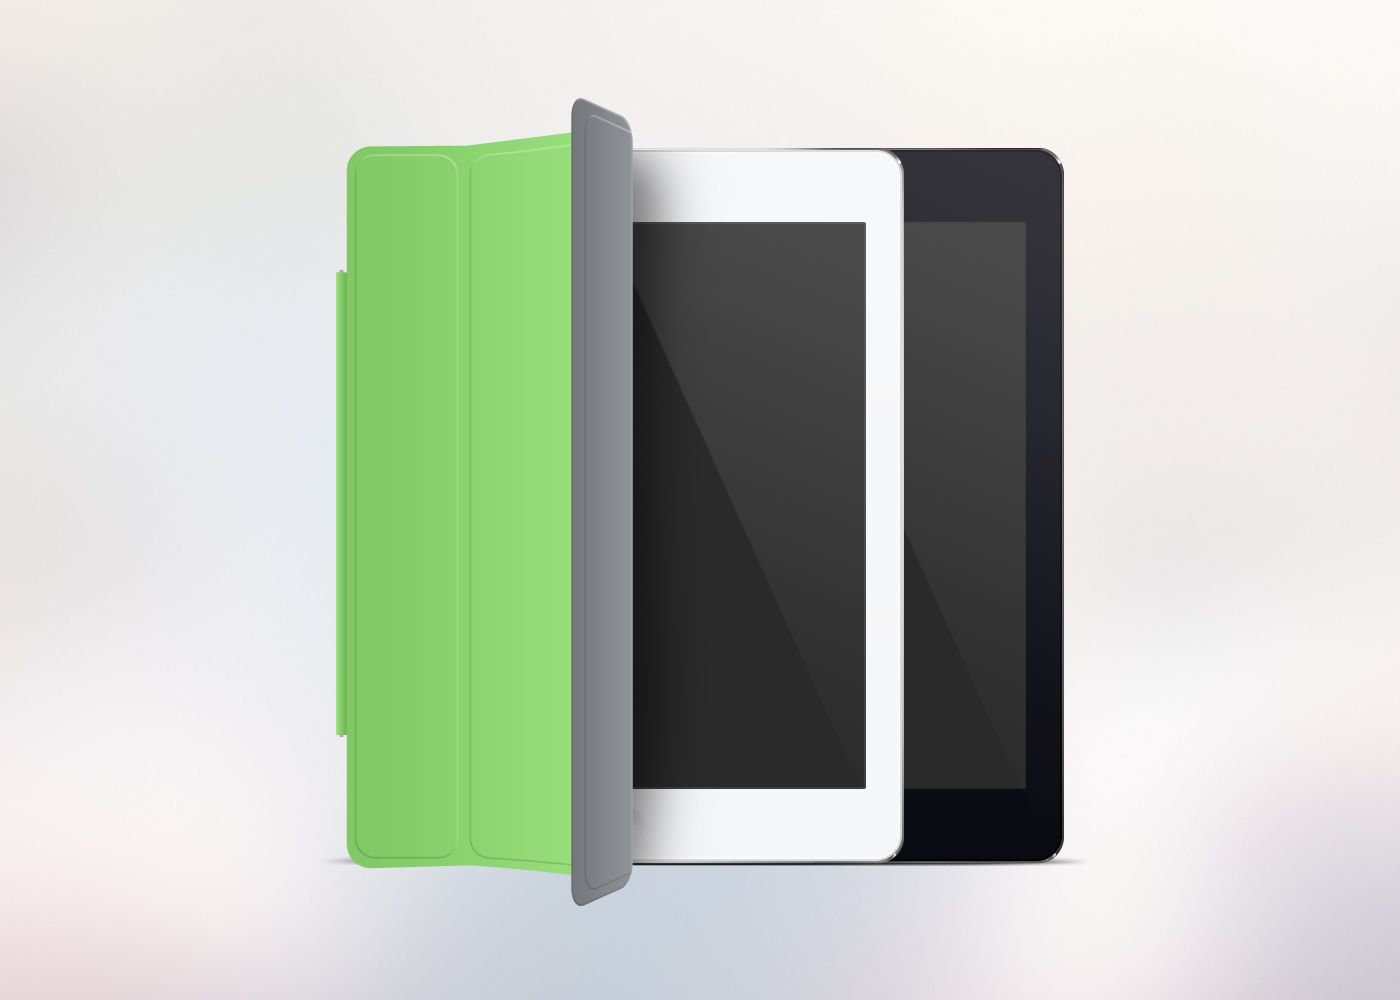 Black and White iPad Air Mockups | UX / UI / web design ...